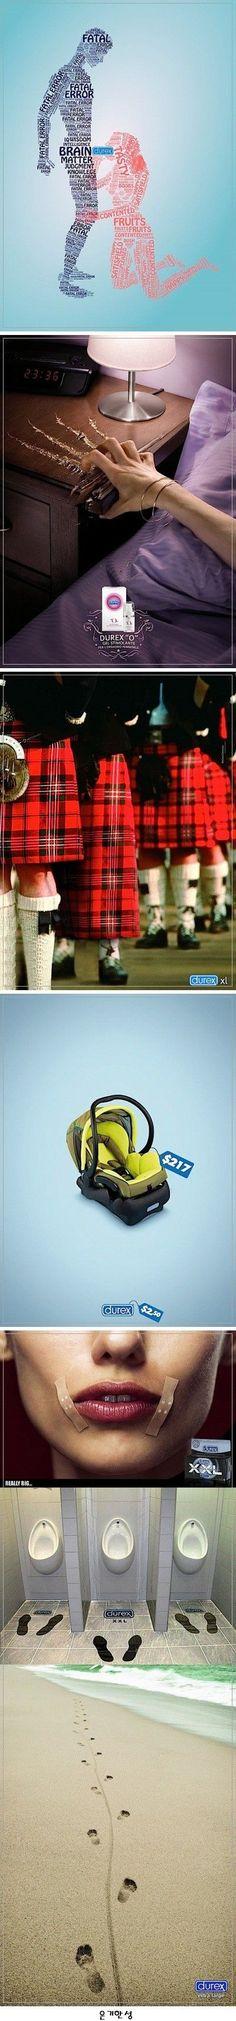 CREATIVE DUREX CONDOM ADS 상상력을 자극 하는 콘돔 광고